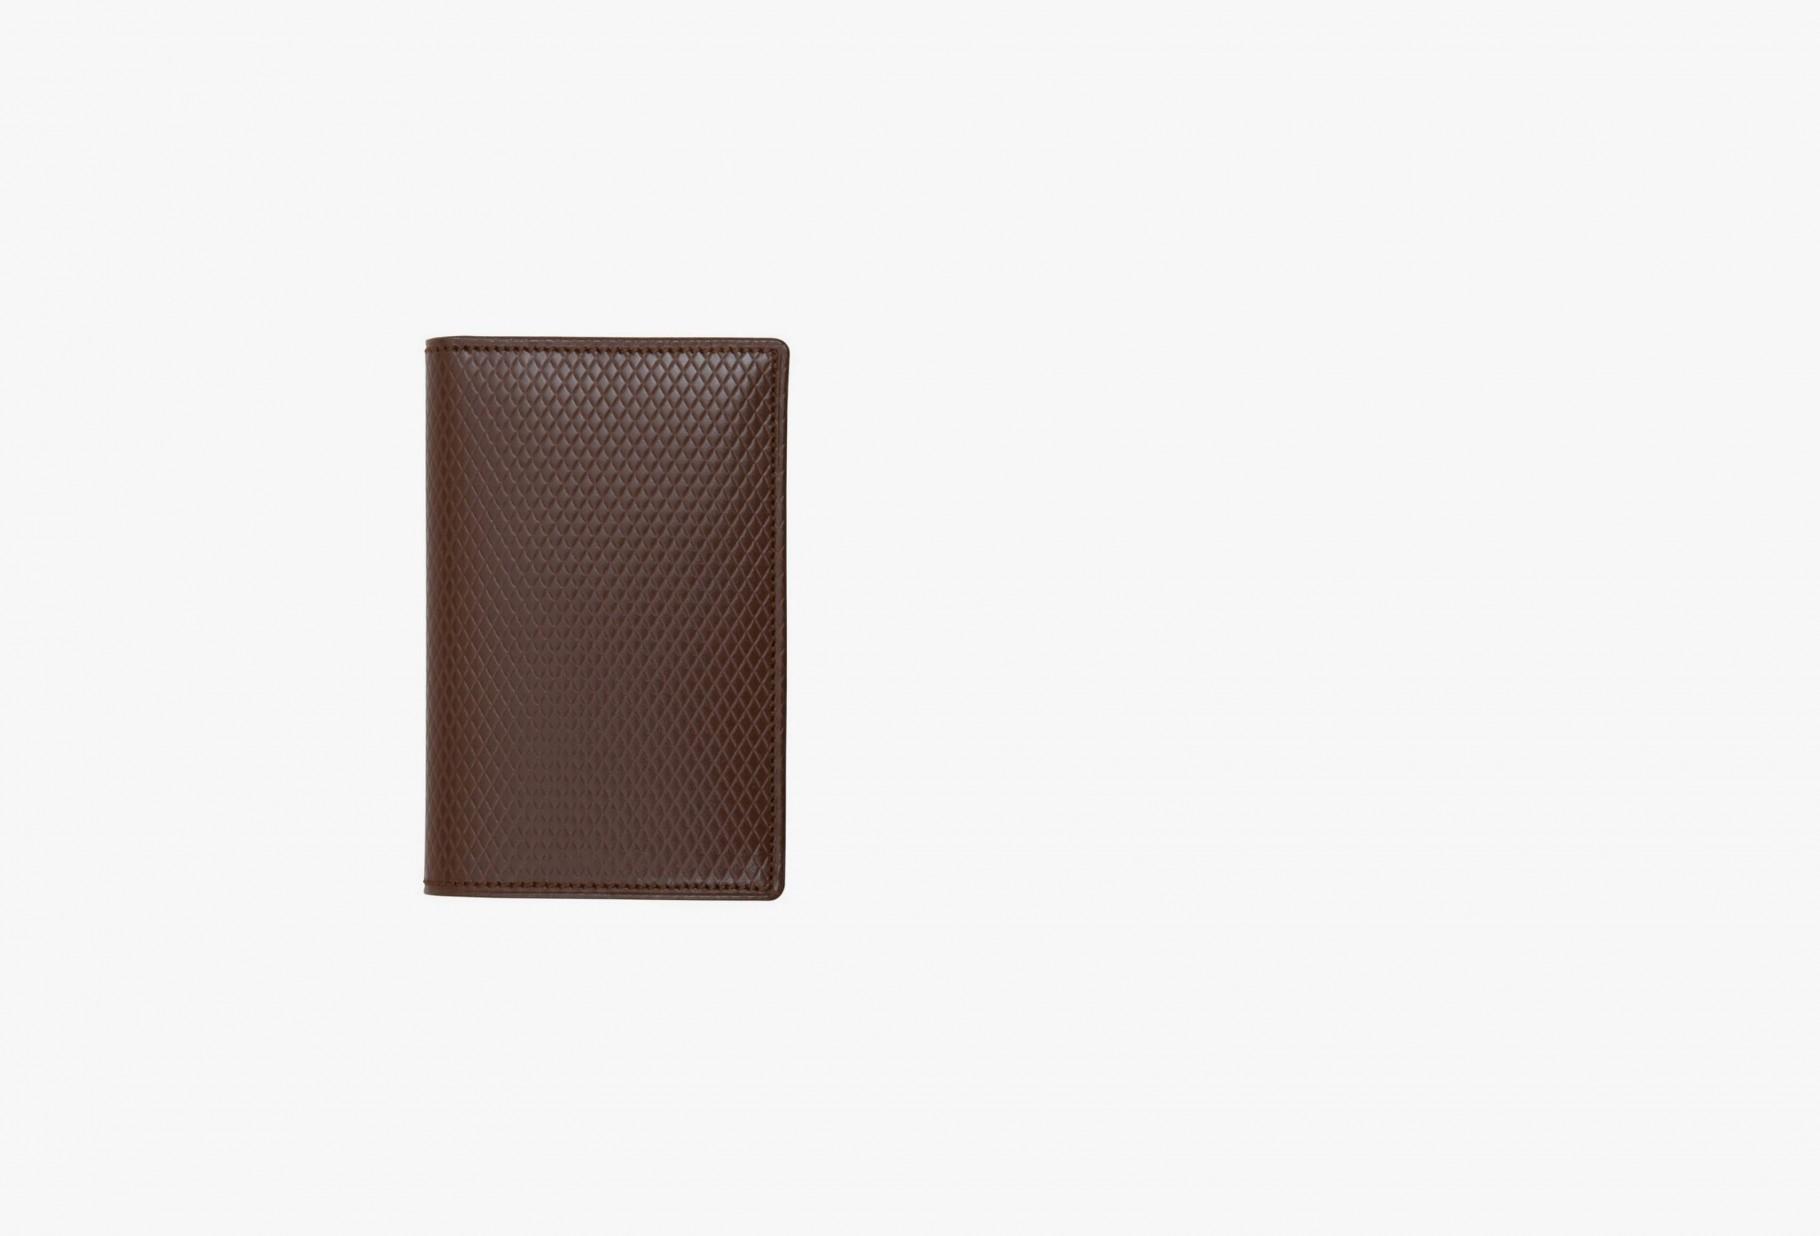 COMME DES GARÇONS WALLETS / Cdg luxury group sa6400lg Brown